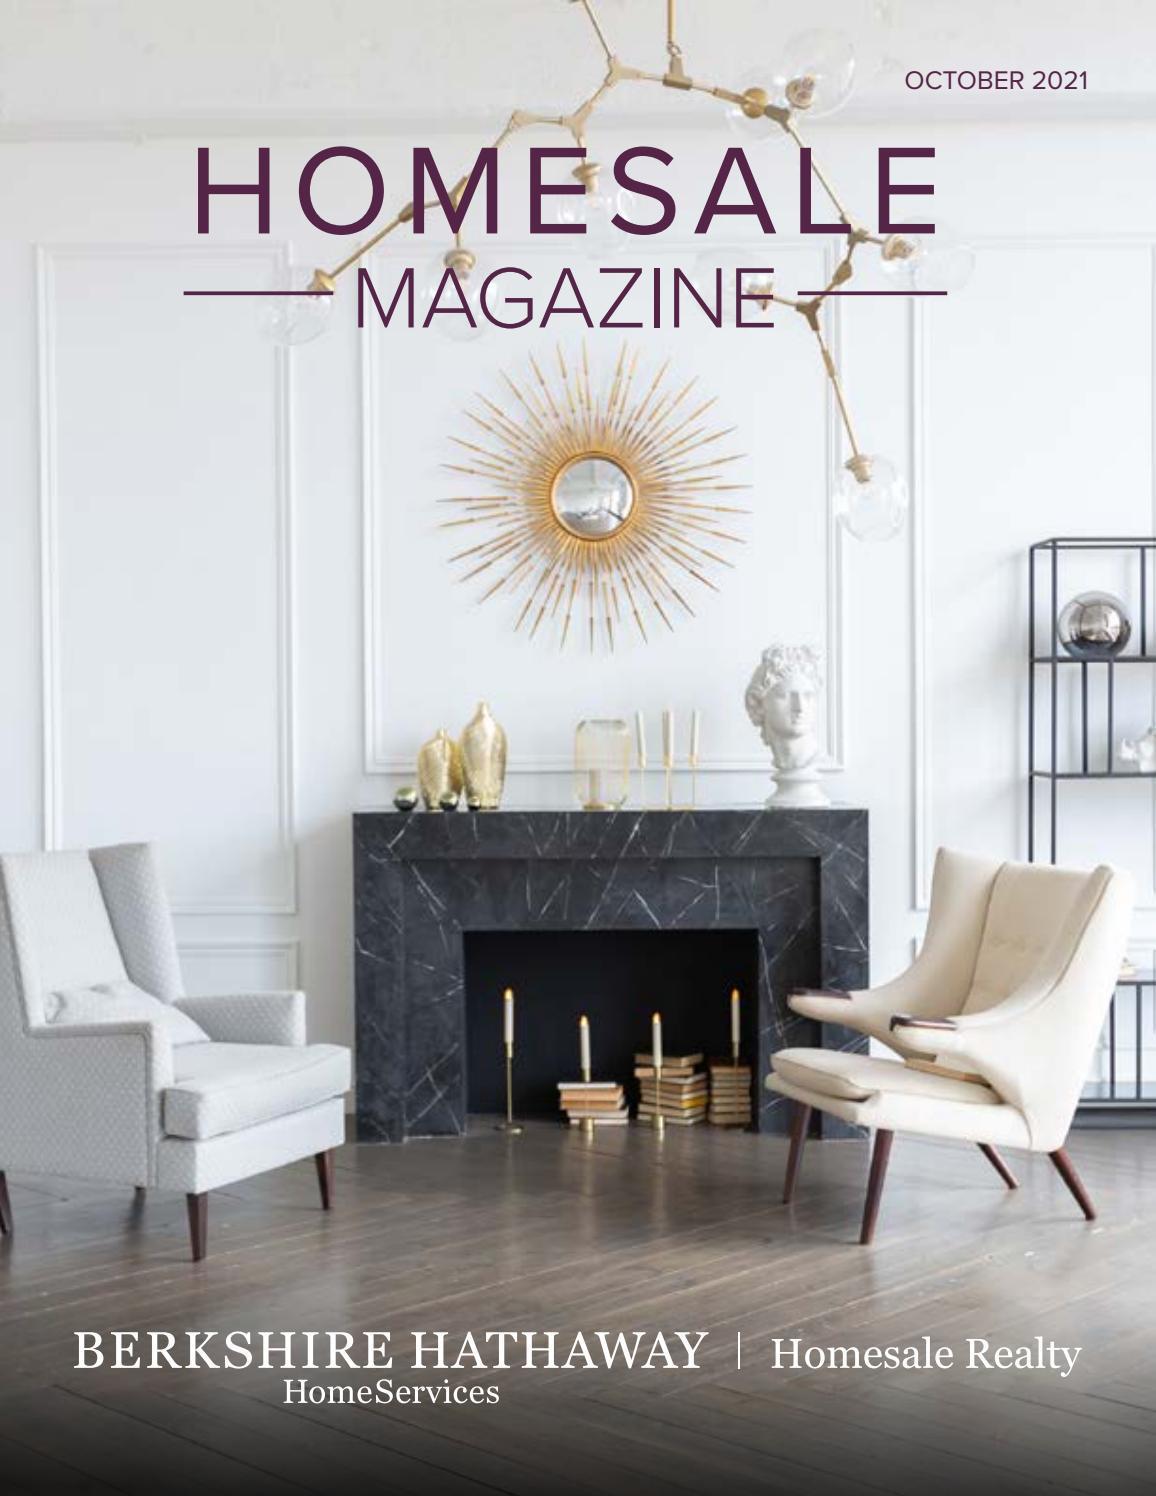 Homesale Magazine October 2021